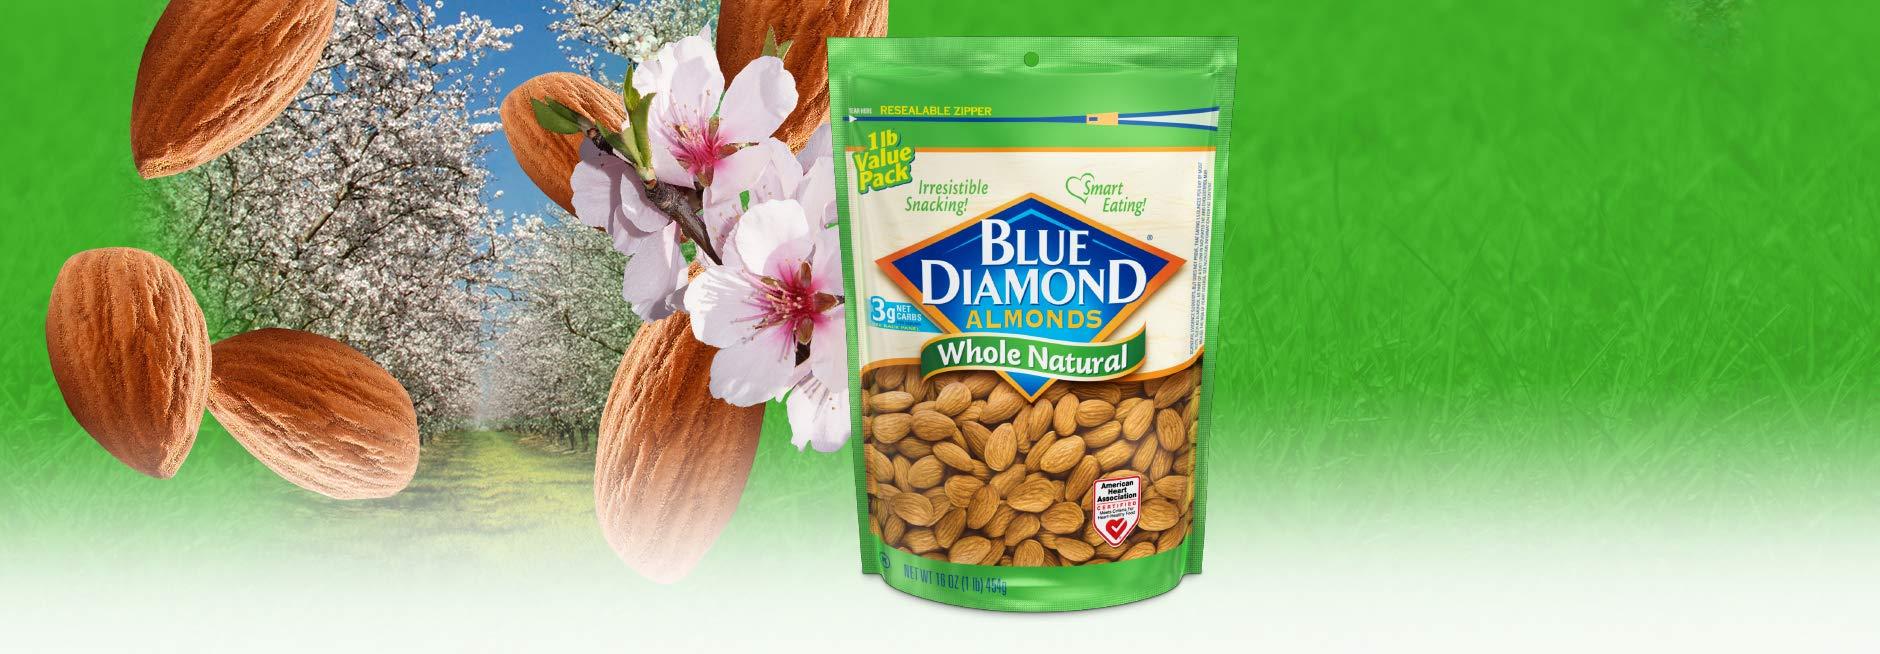 Blue Diamond Almonds, Raw Whole Natural, 16 Ounce by Blue Diamond Almonds (Image #4)